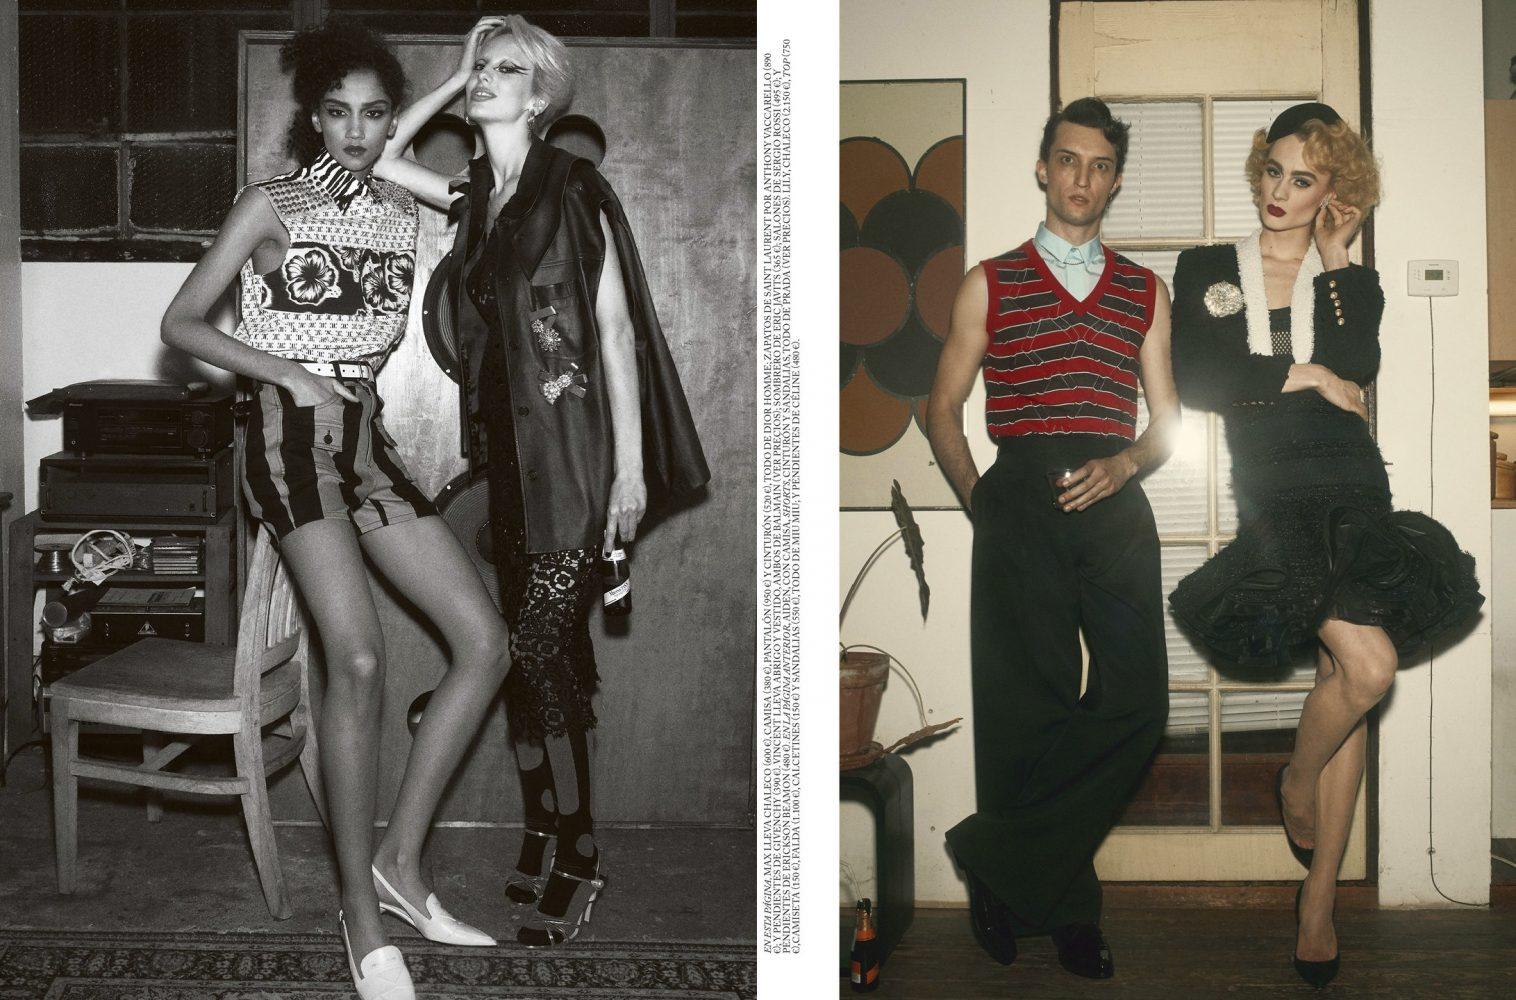 Vogue Spain by Shaun Beyen